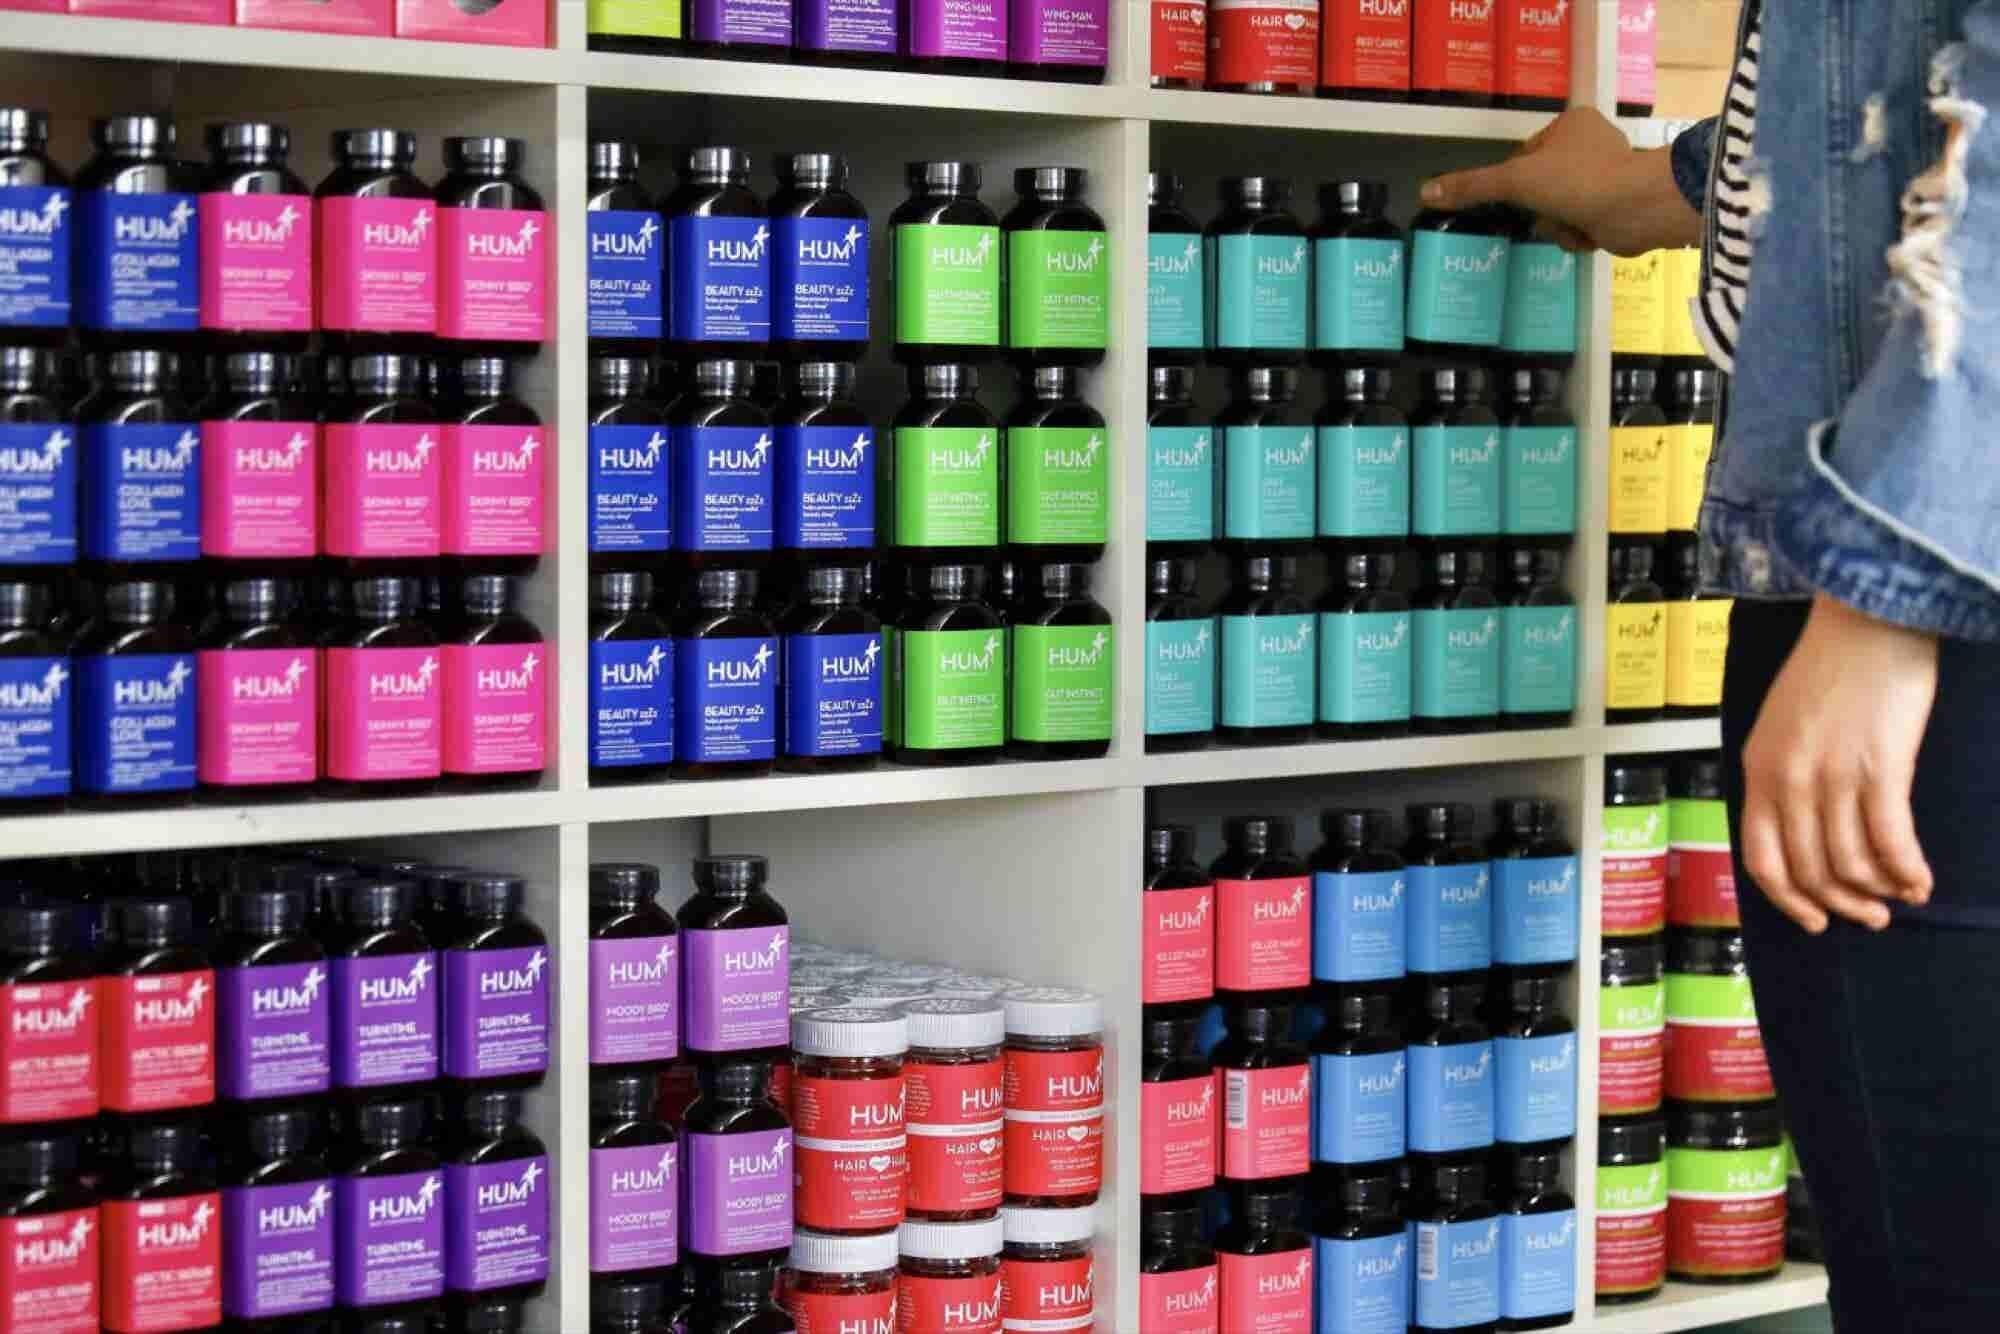 How a Wellness Brand Built an Office Using Feng Shui and Numerology